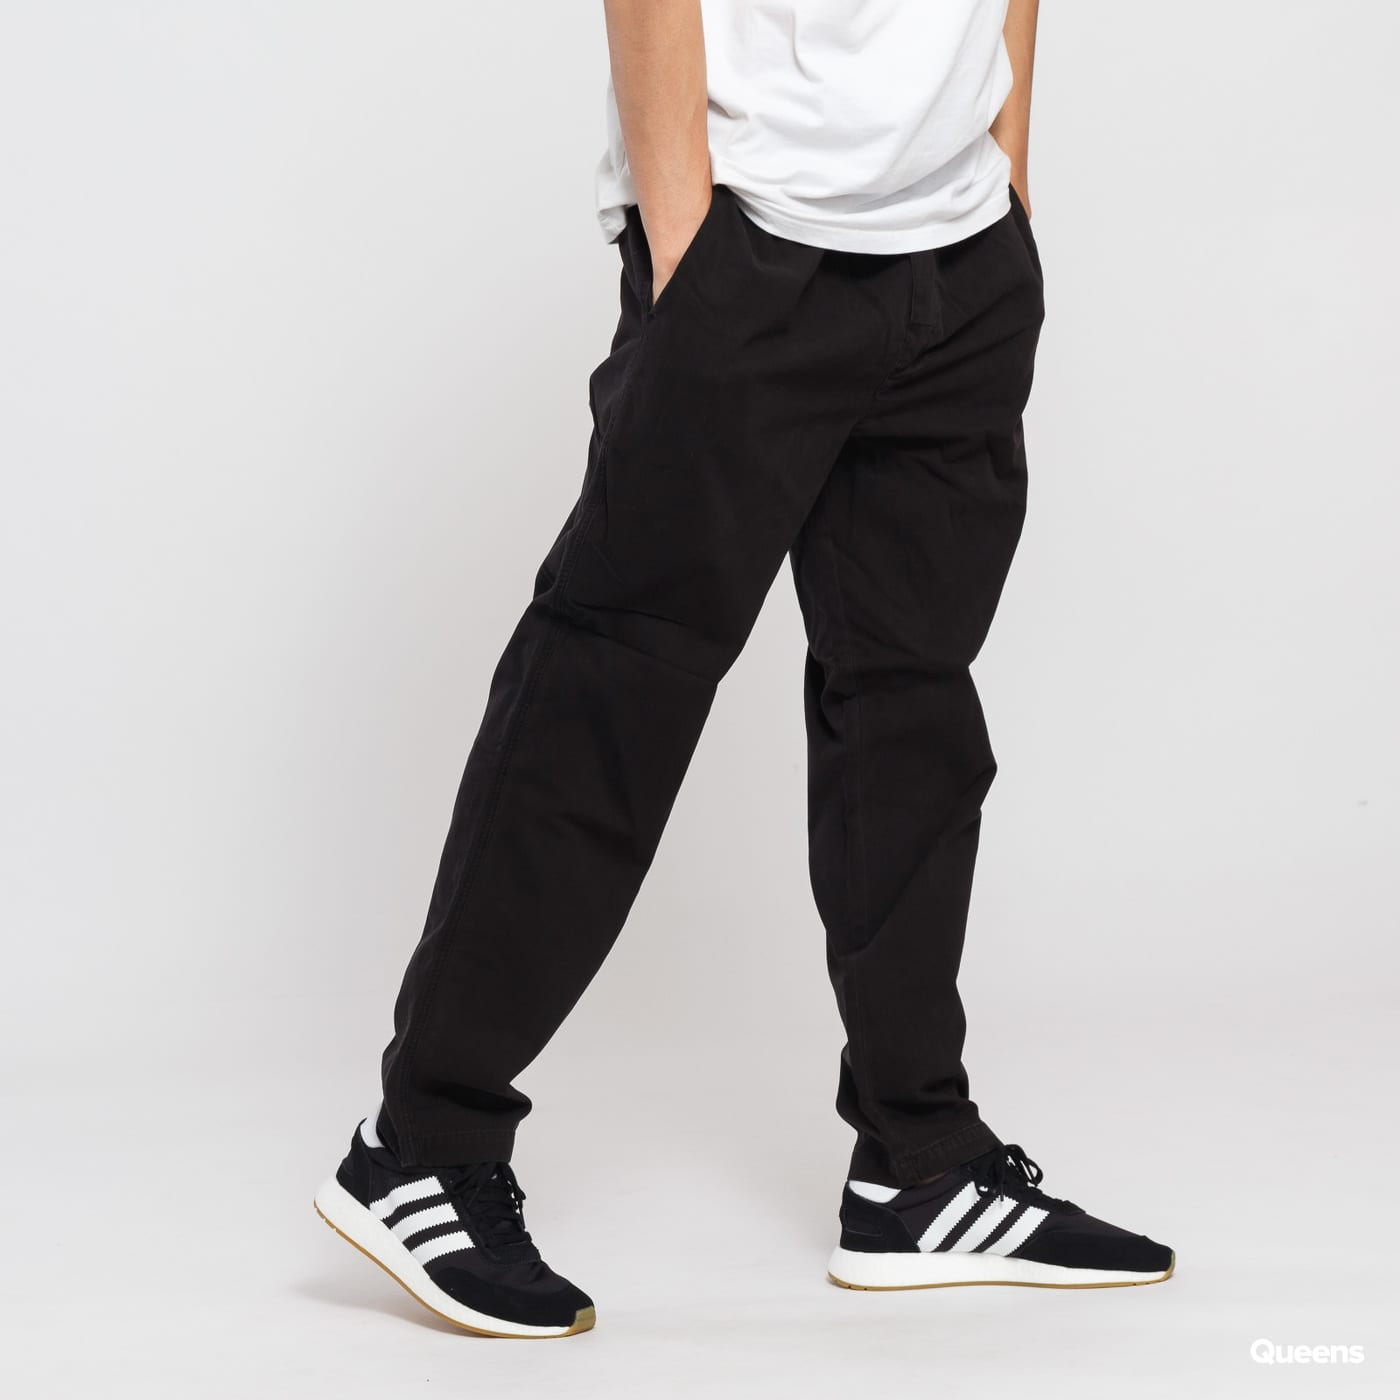 94891cd7a07 Pants Stüssy Brushed Beach Pant black (116345 / 0001) – Queens 💚